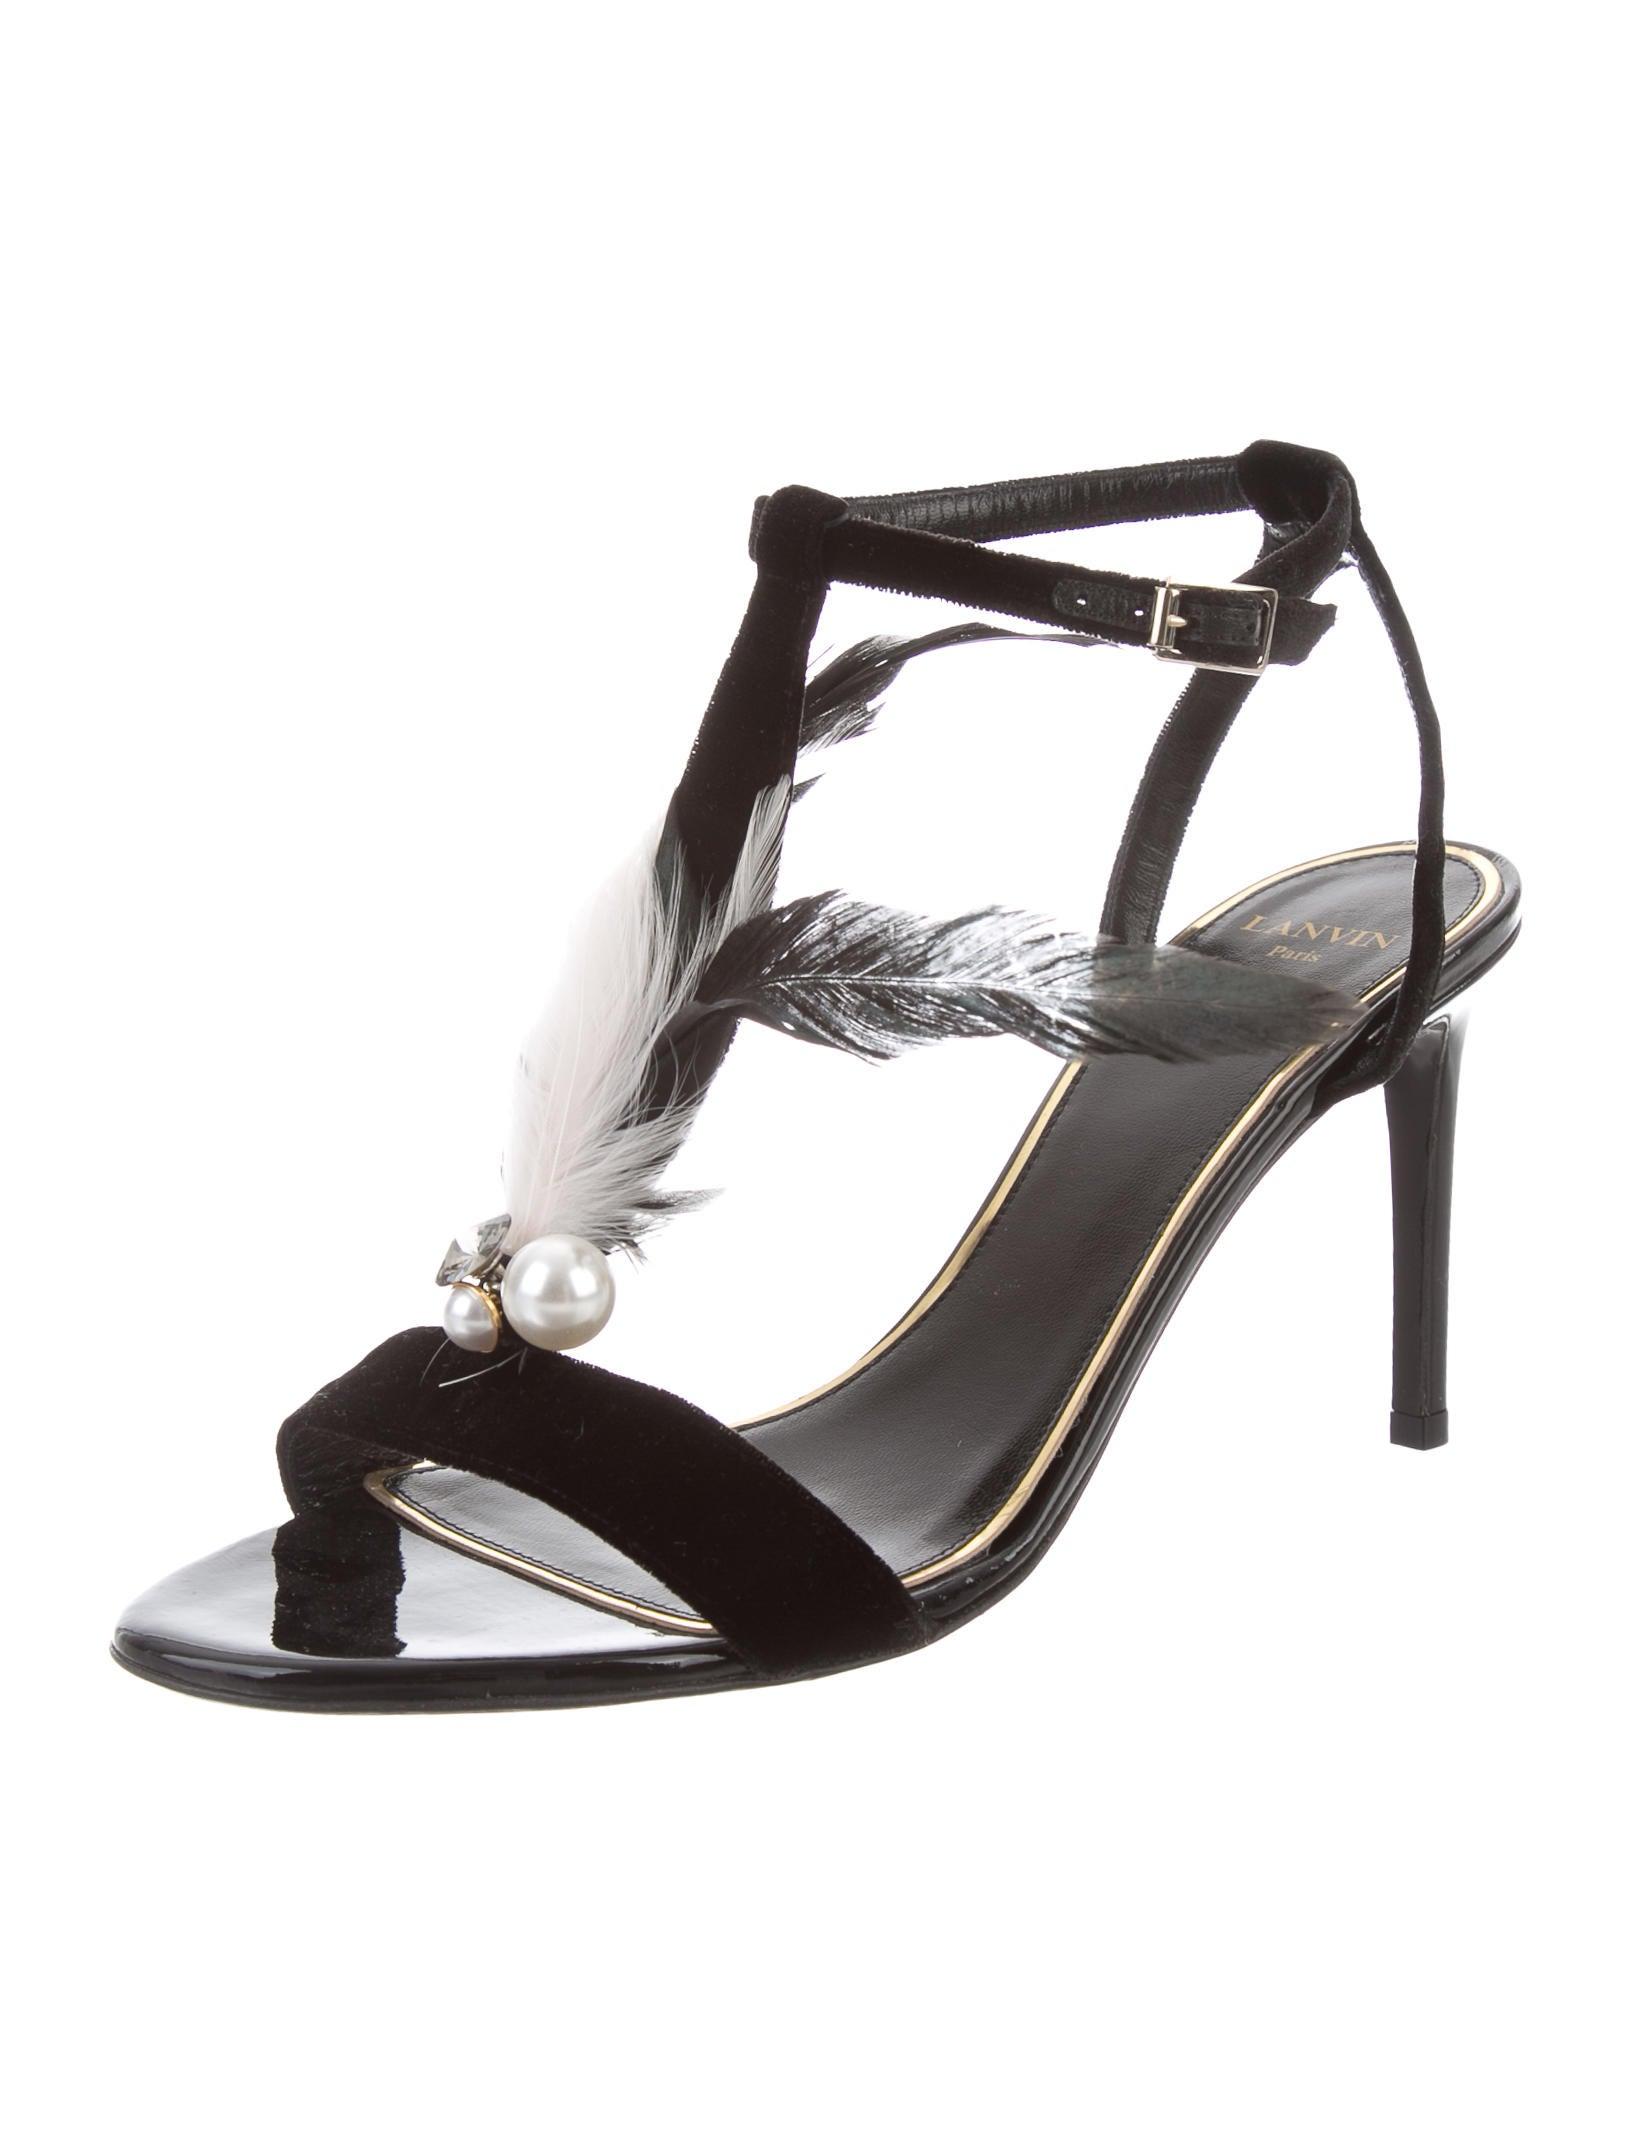 affordable quality original Lanvin Feather-Trimmed Velvet Sandals shopping online tumblr cheap online 89L7Wv3r